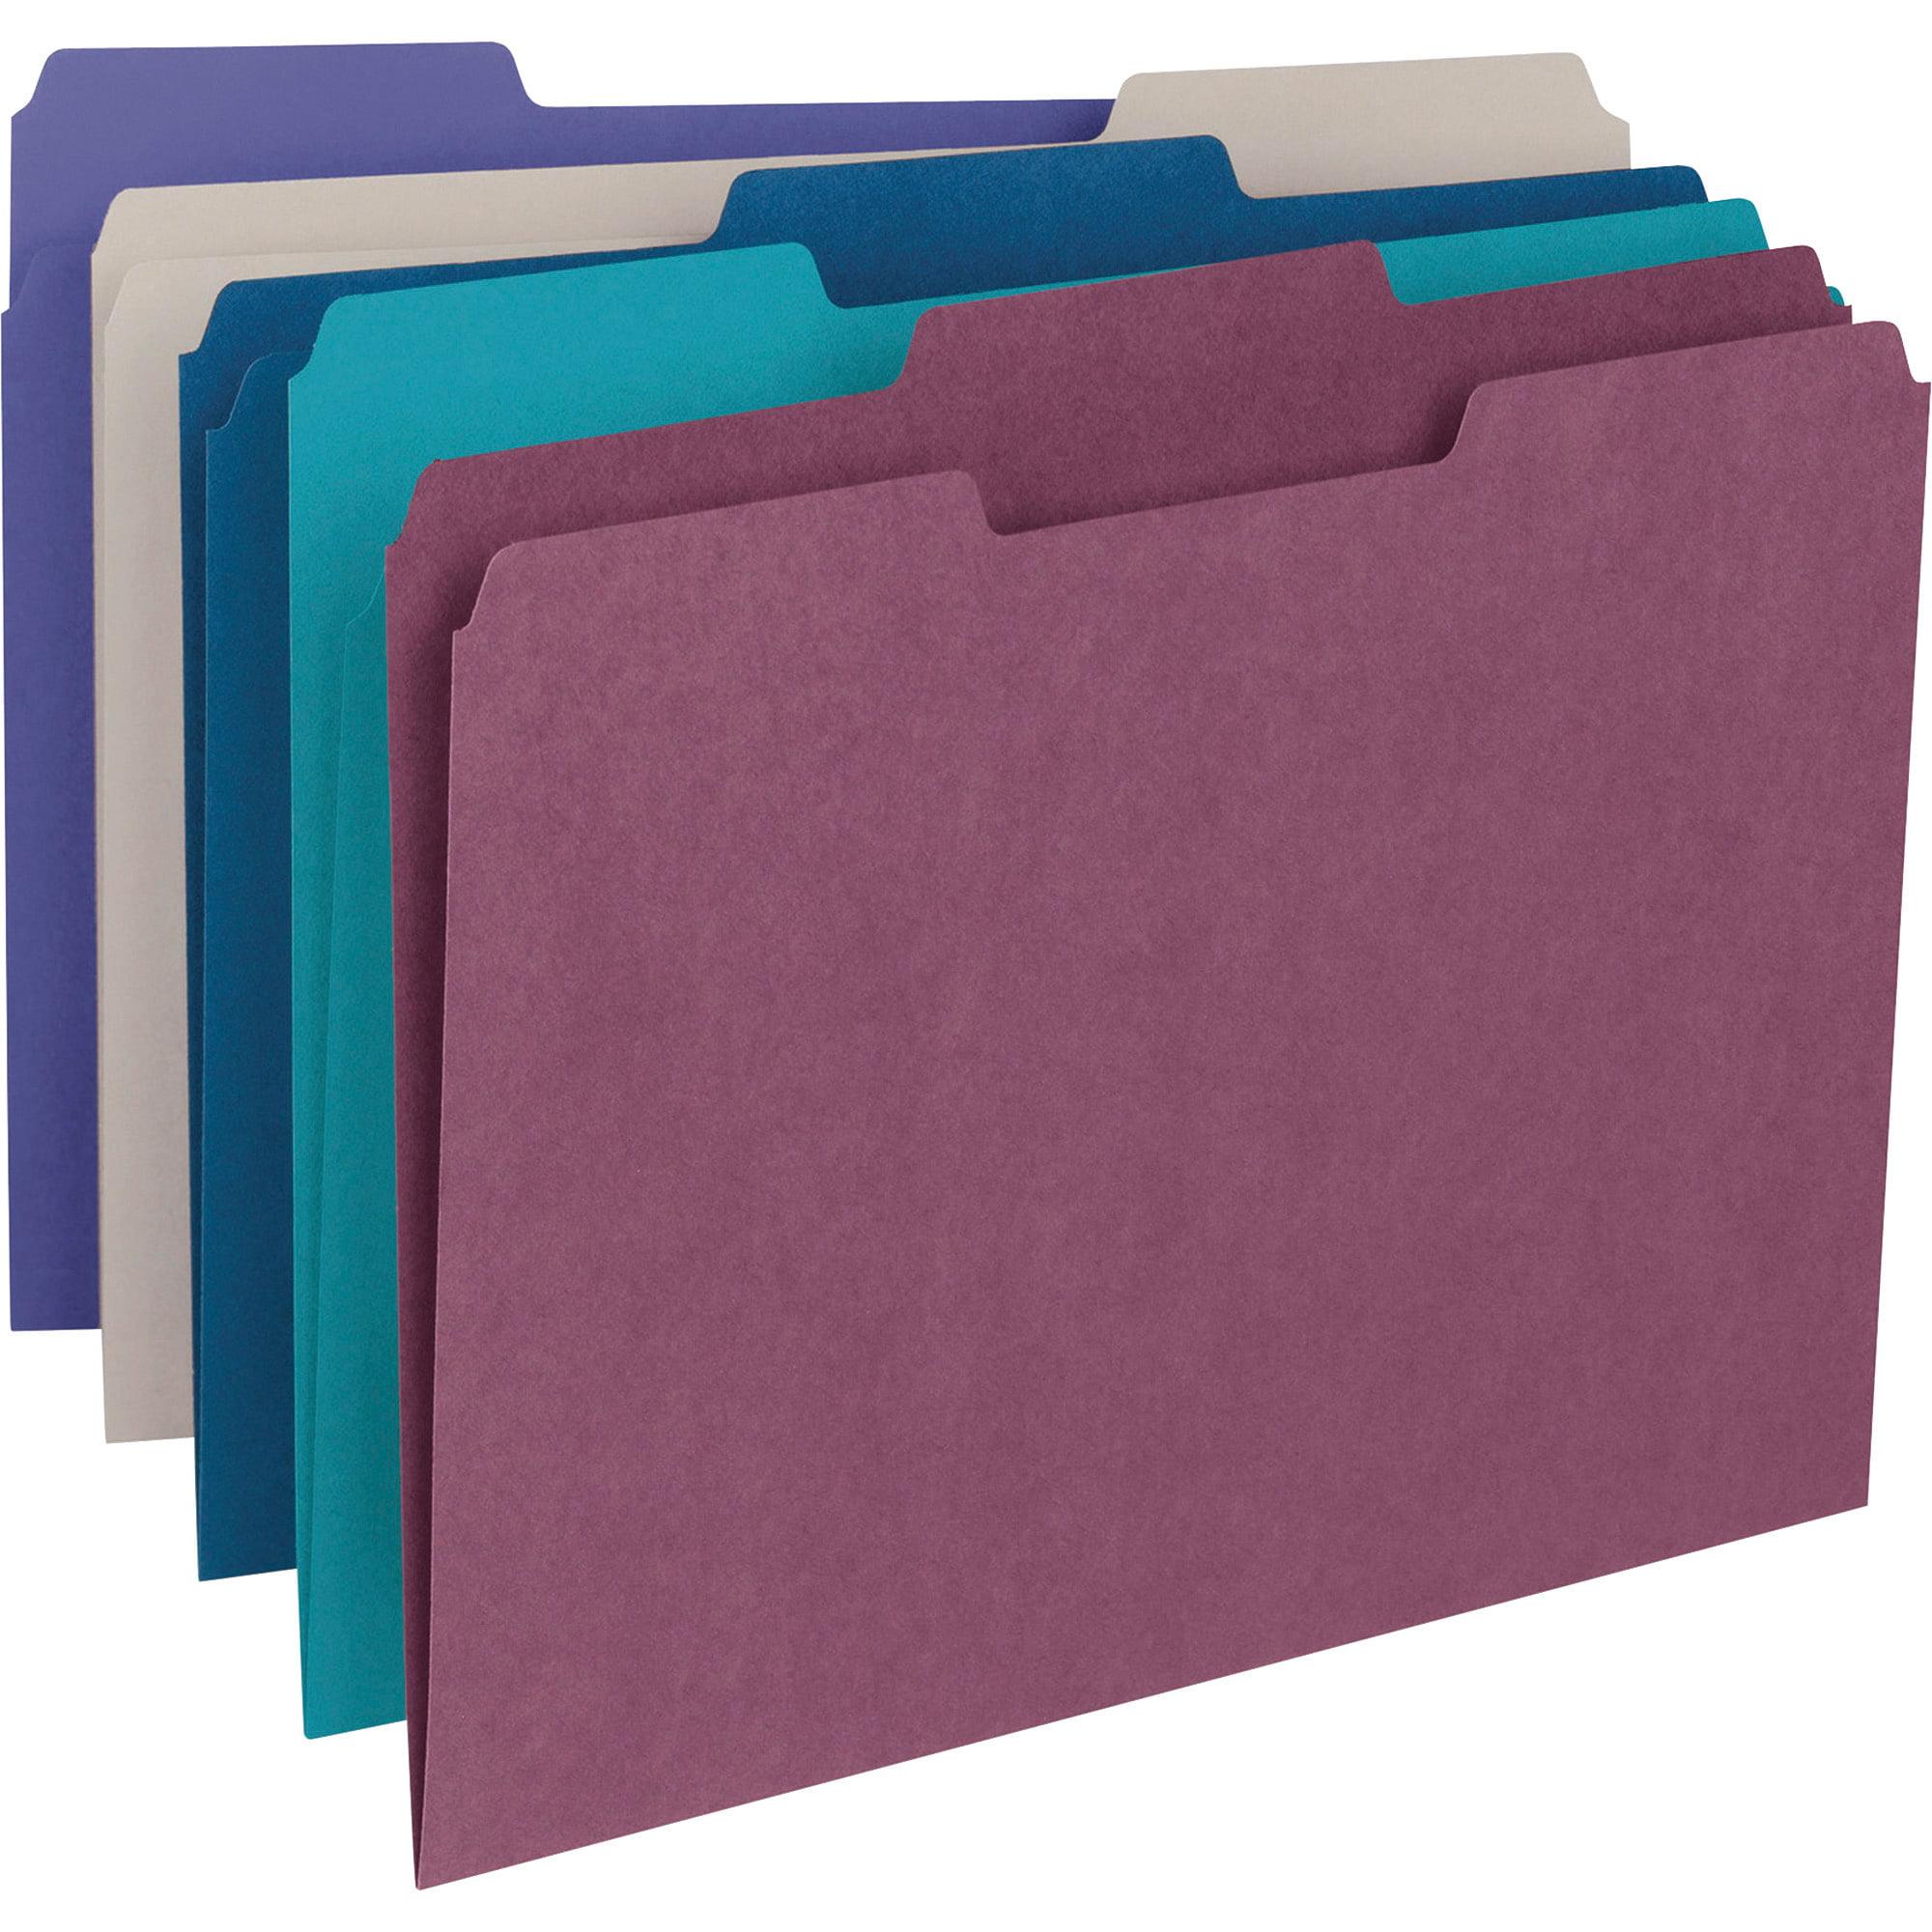 Red 1//3-Cut Tab 100 per Box 12743 Letter Size Smead File Folder